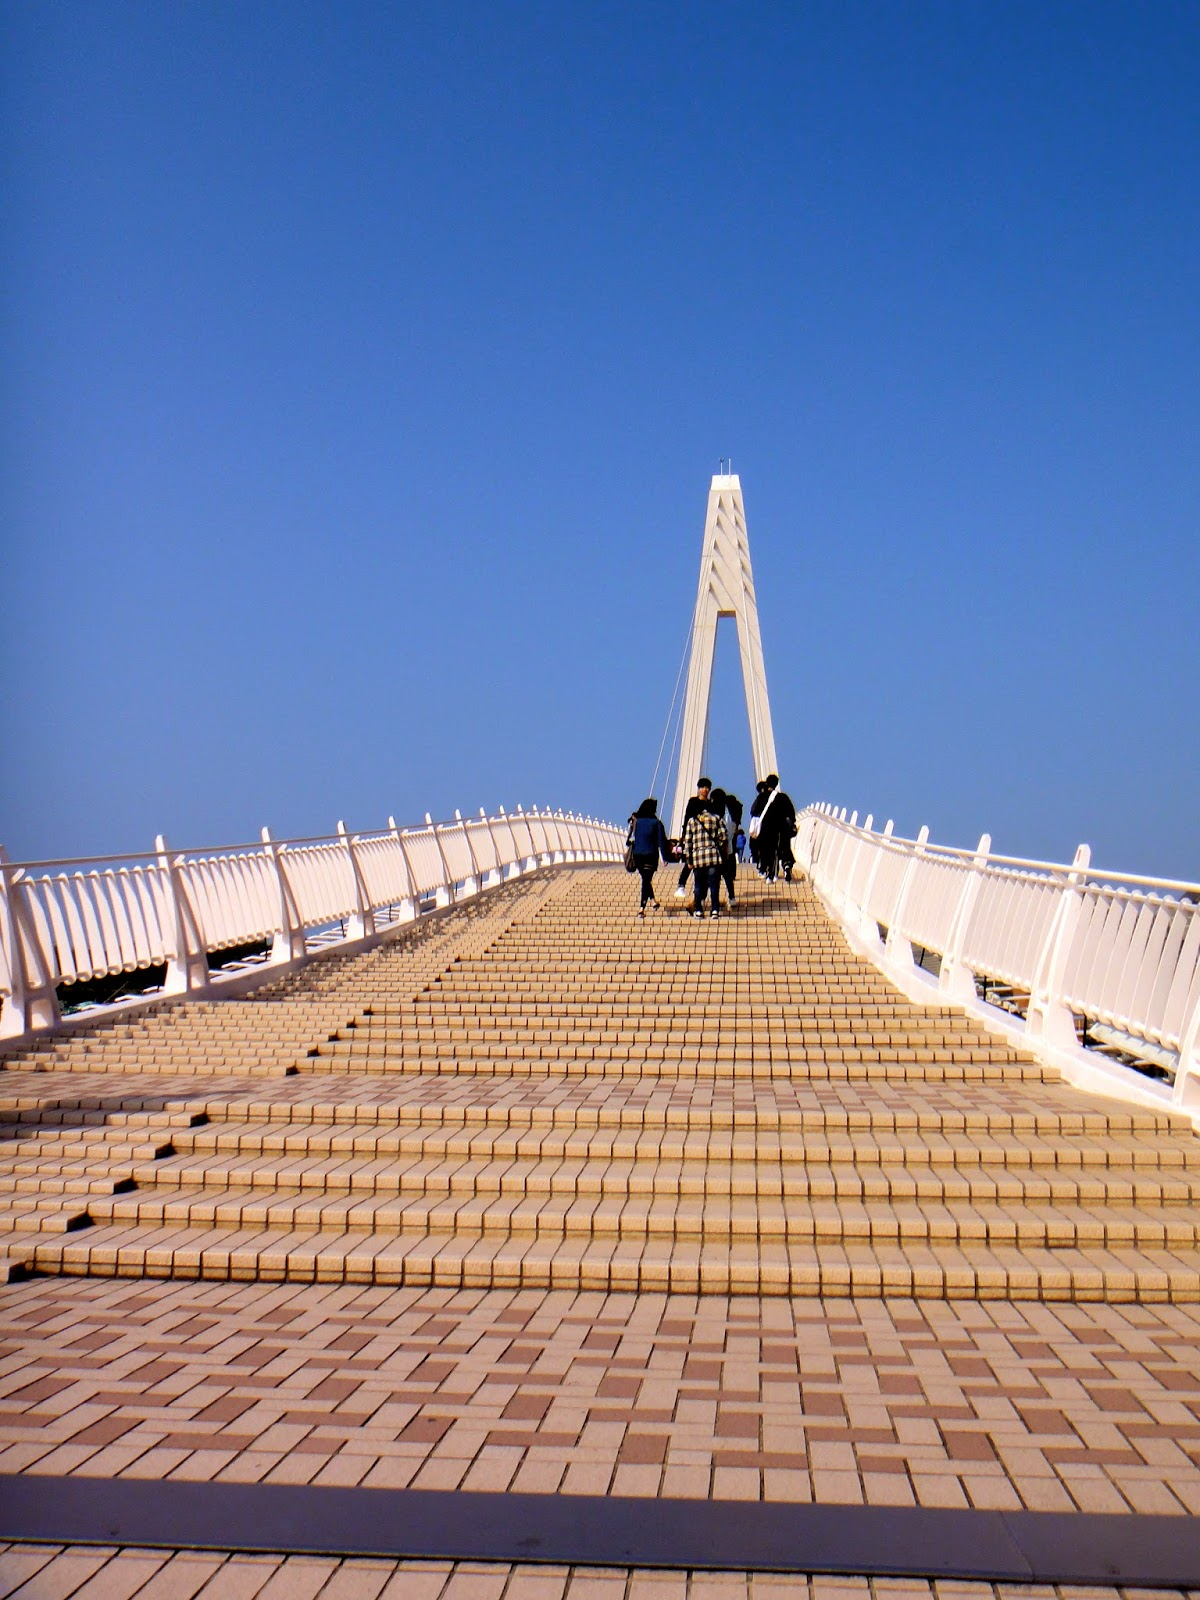 Crossing Lover's Bridge Tamsui Taiwan